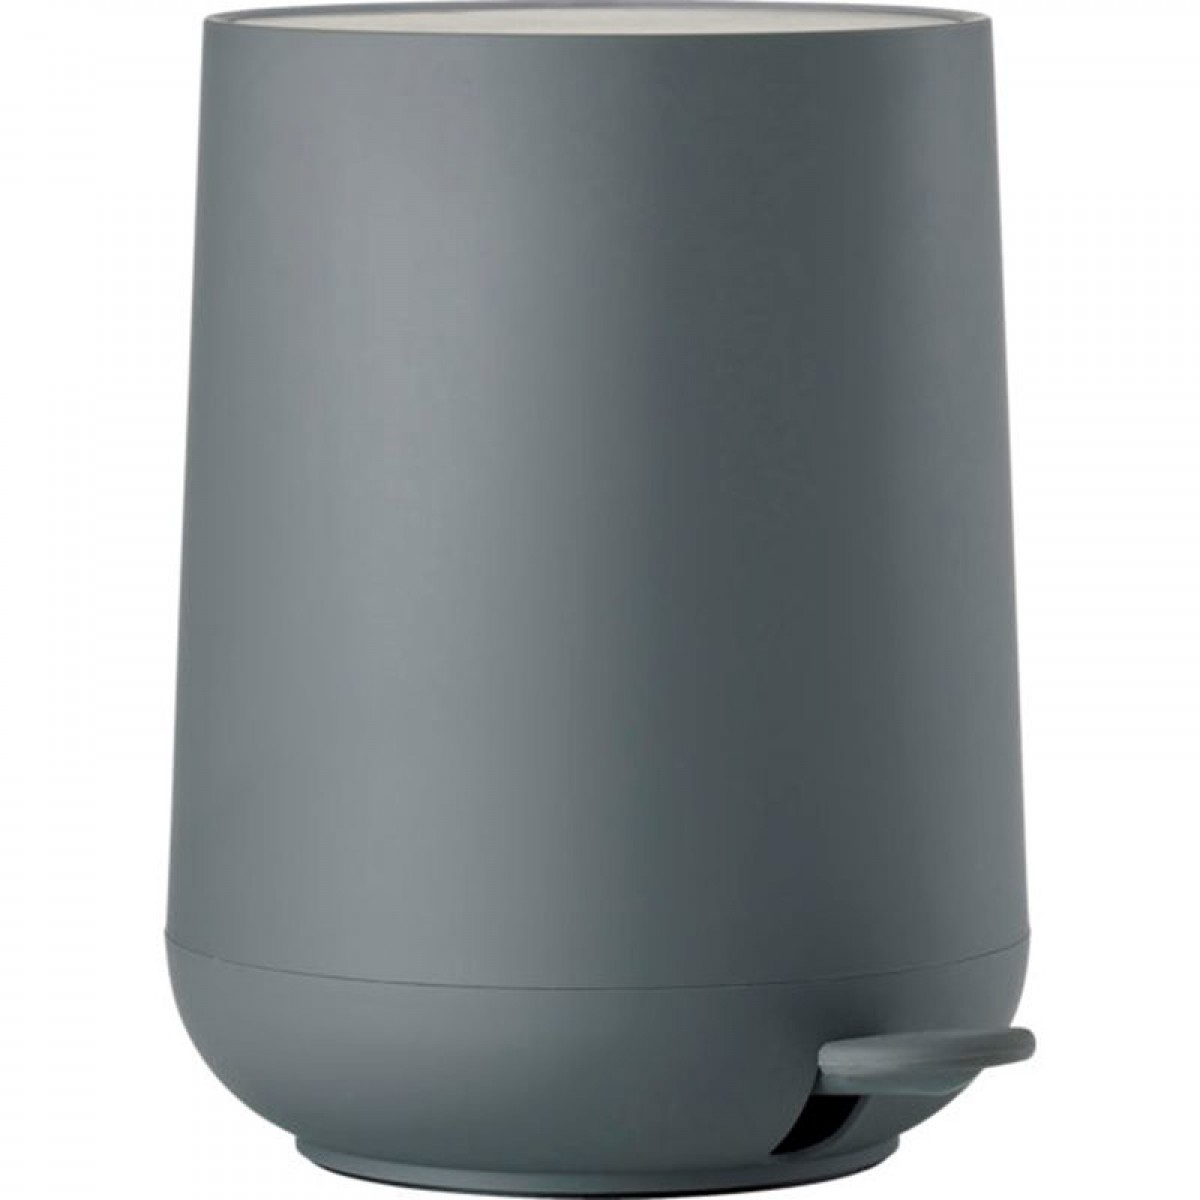 ZONE Pedalspand grå 3 L